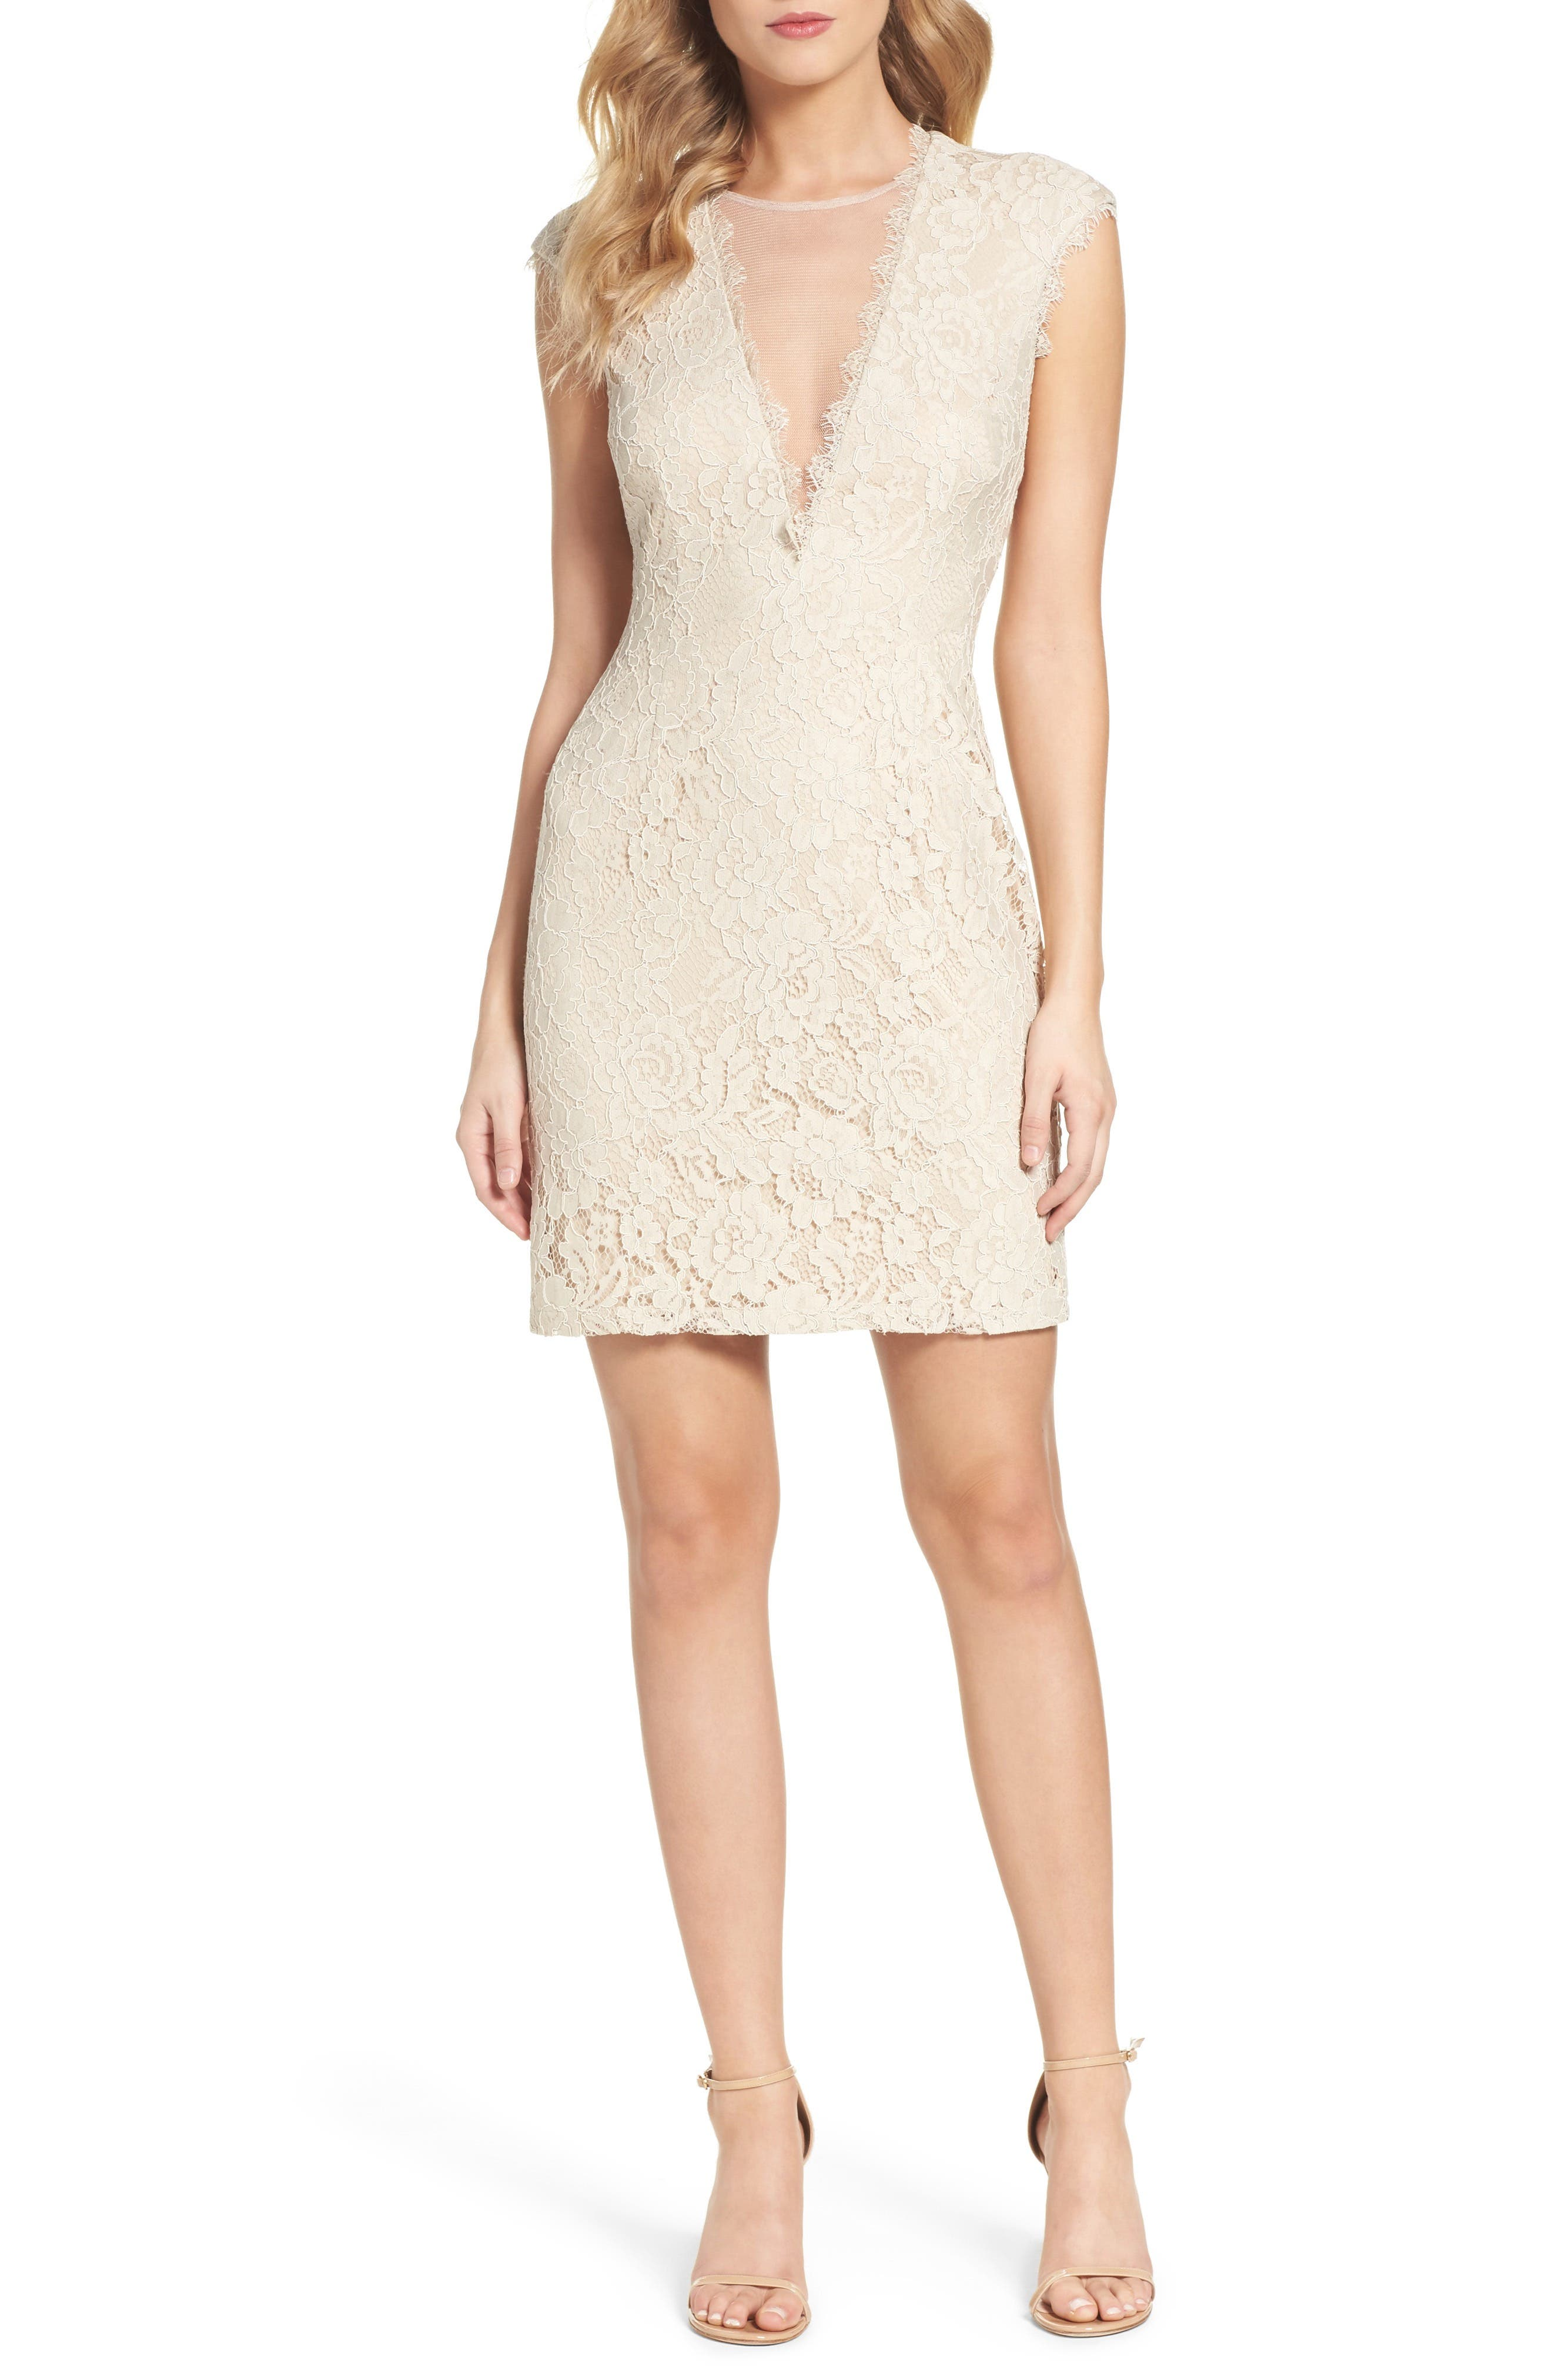 Alternate Image 1 Selected - Aidan by Aidan Mattox Open Back Lace Sheath Dress